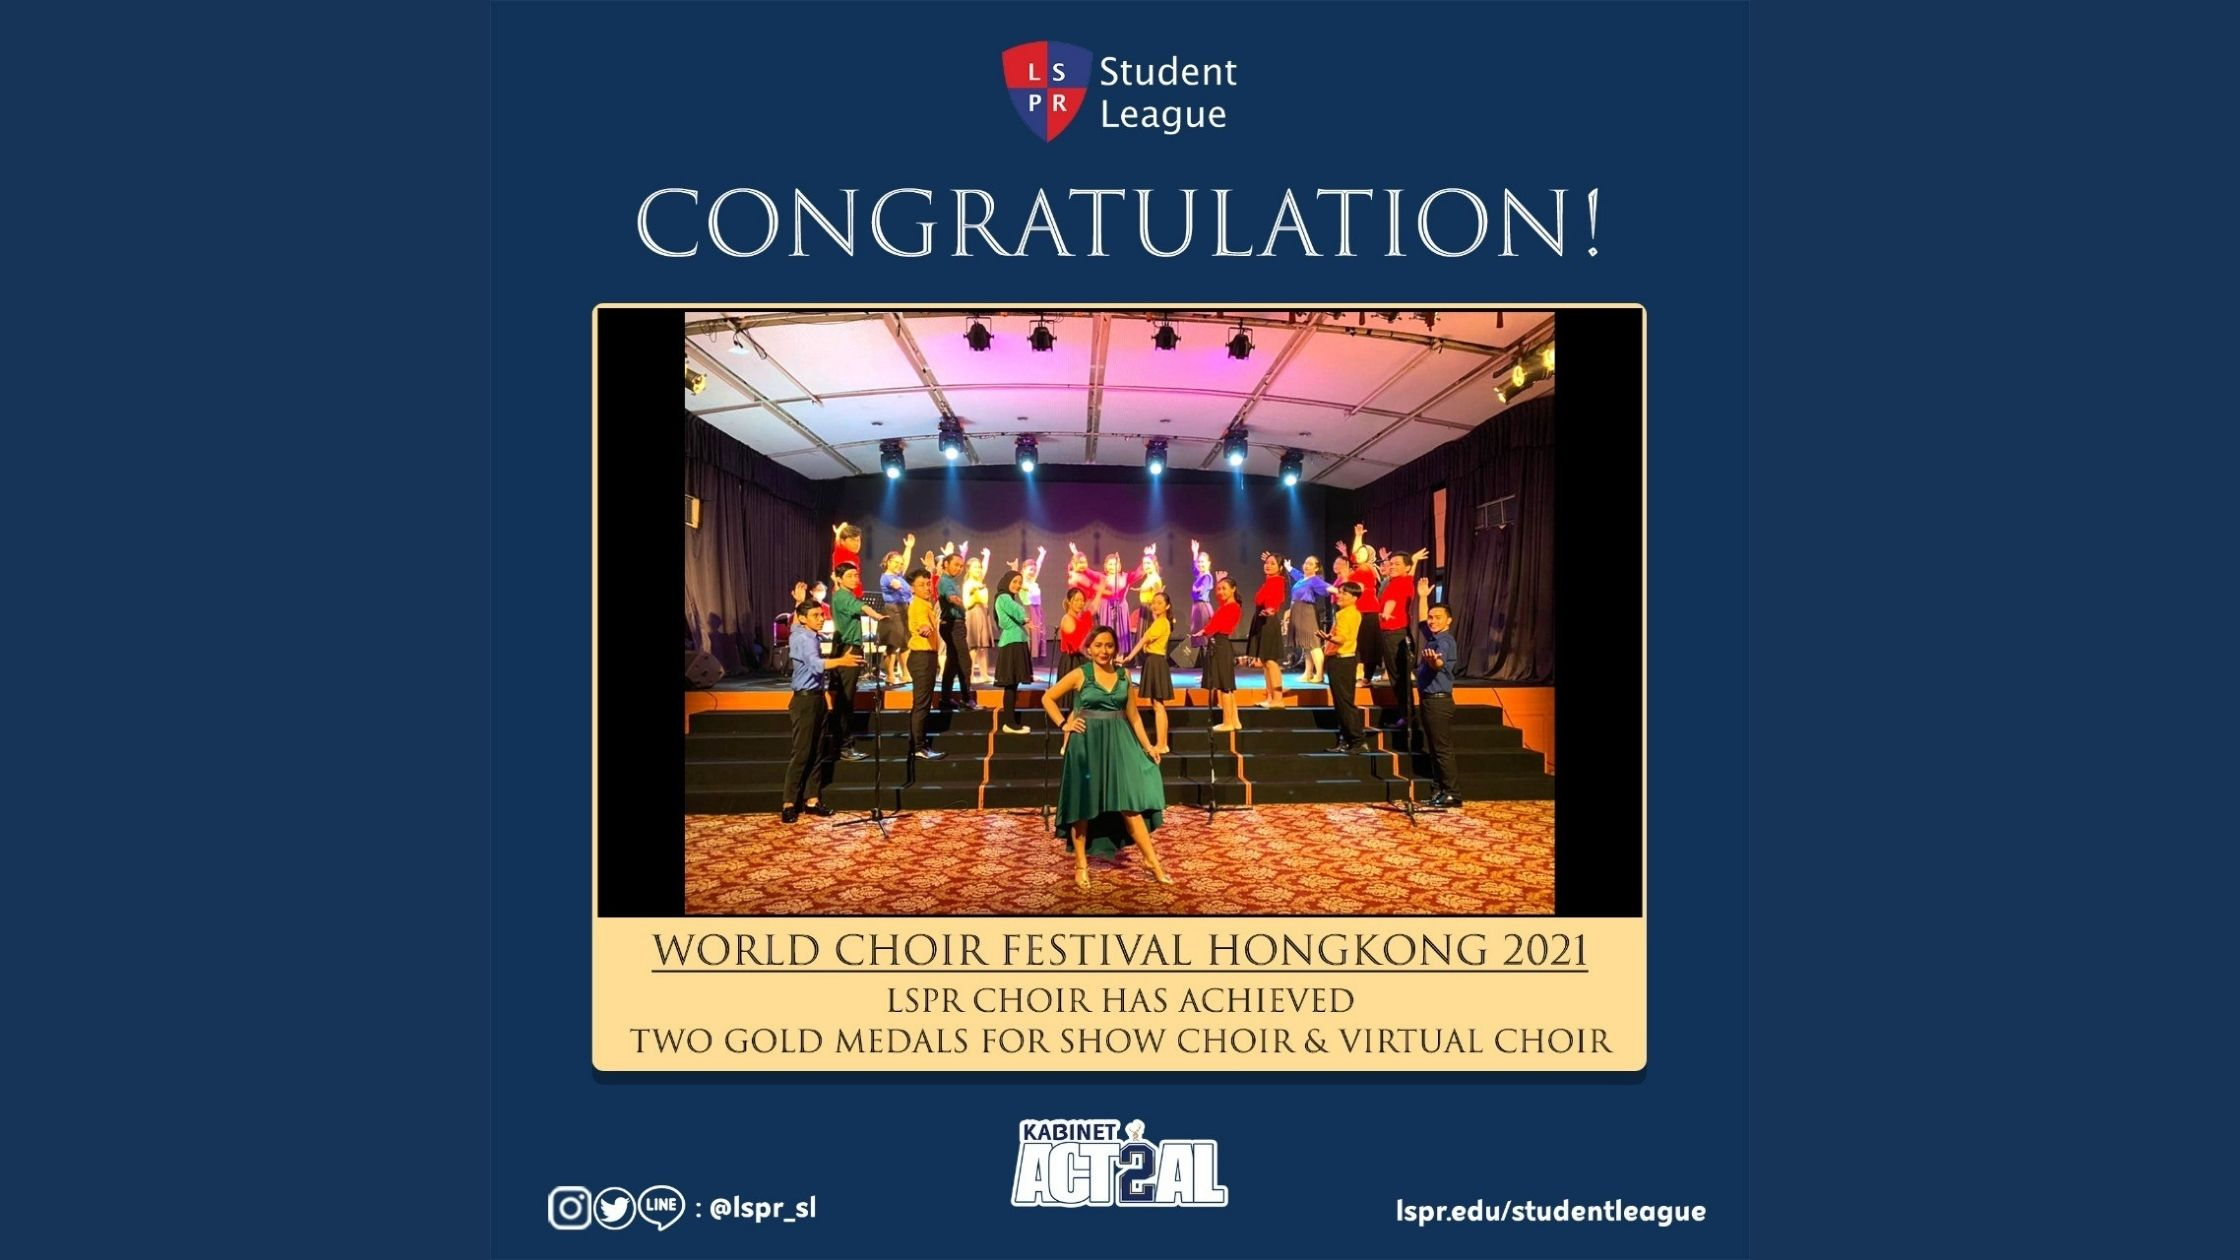 [HEADLINE] LSPR Choir Won Competition World Choir Festival 2021